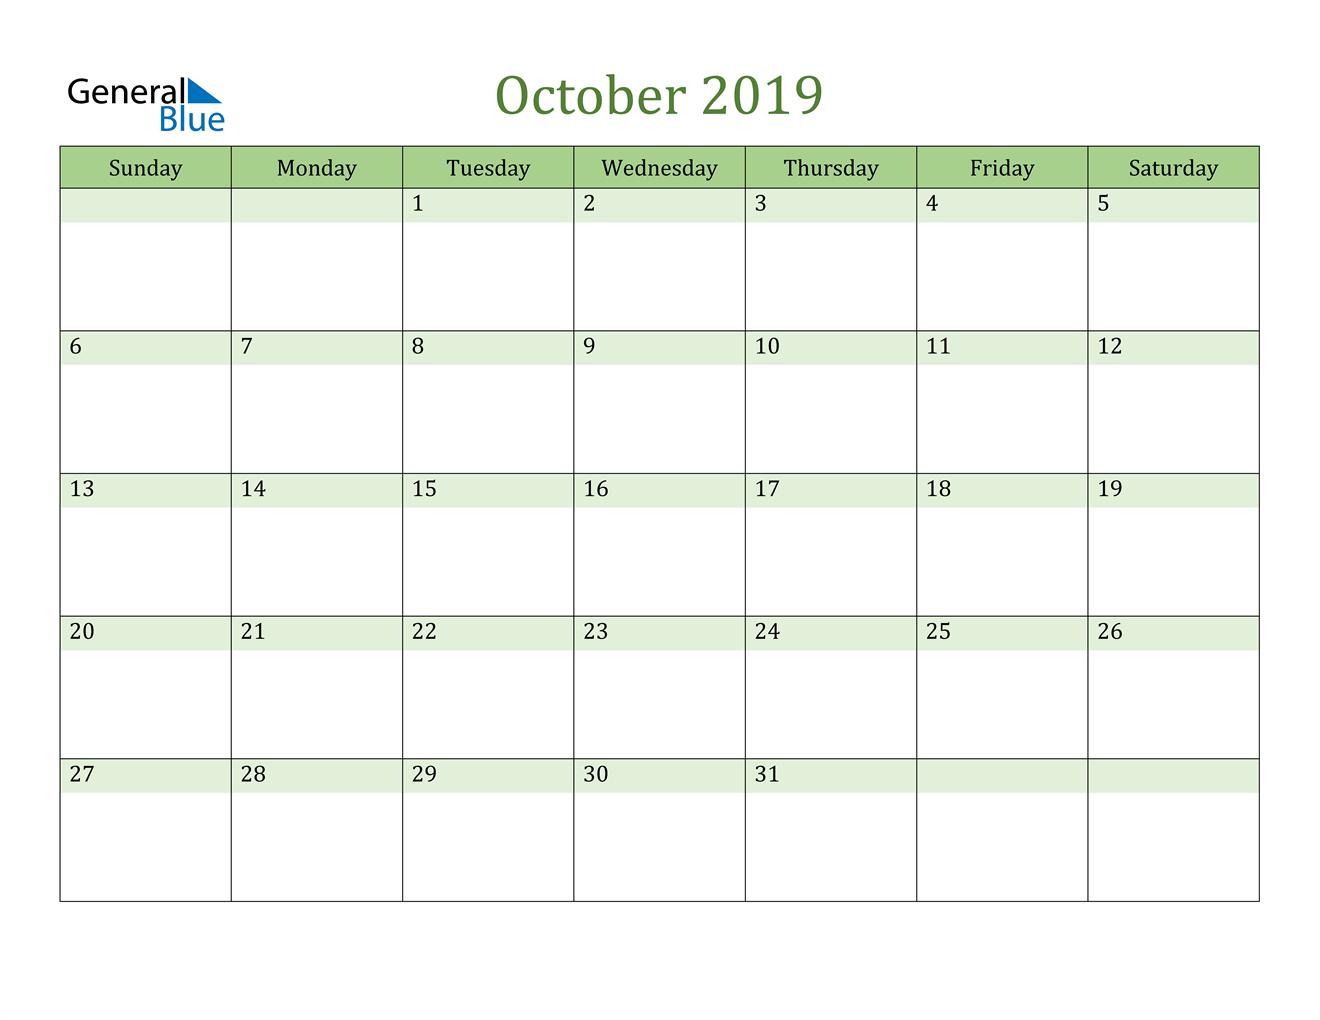 Image of October 2019 Cool and Relaxing Green Calendar Calendar